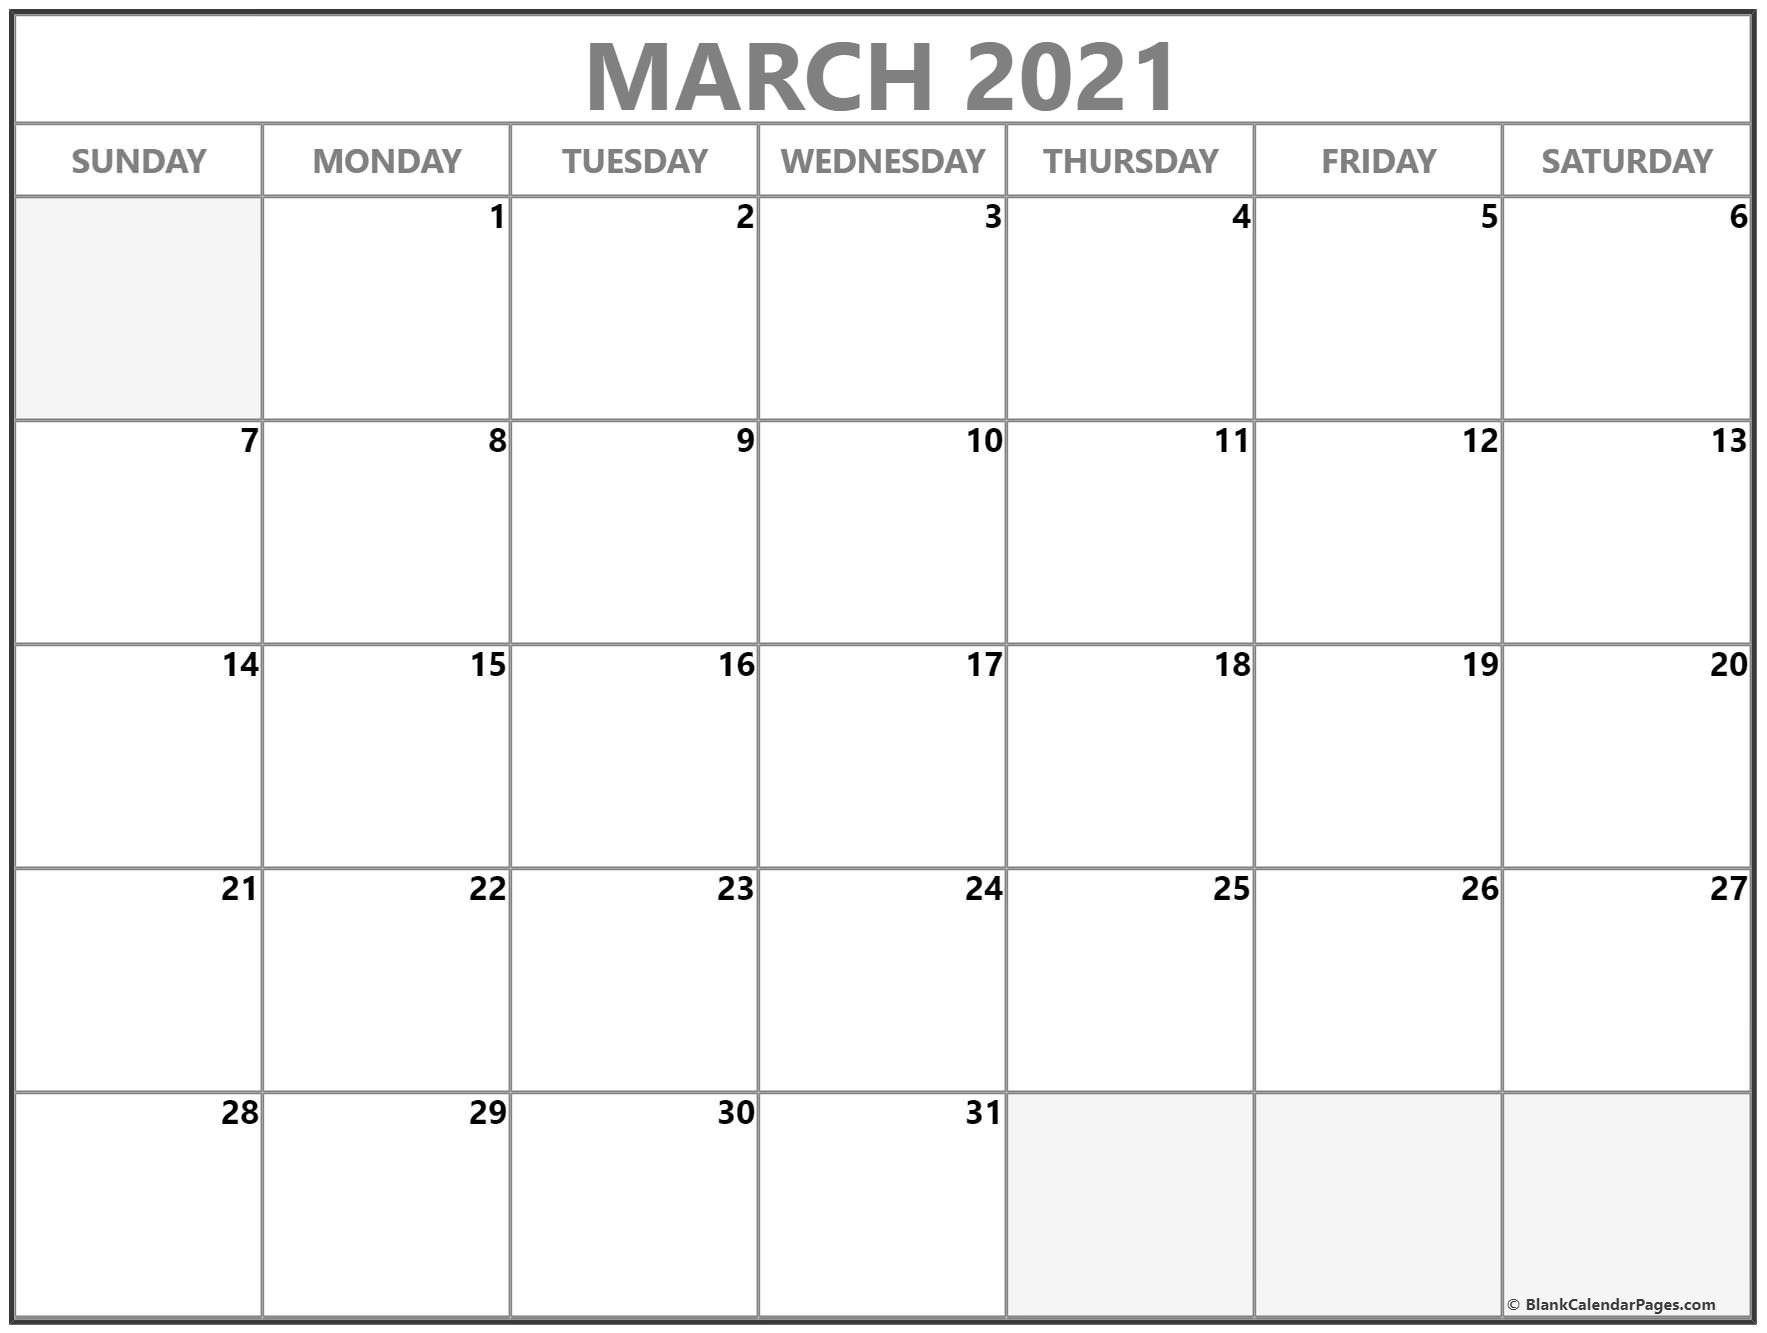 September 2021 Calendar Printable Template | Calendar Printables Free Blank September 2020 To September 2021 Calendar